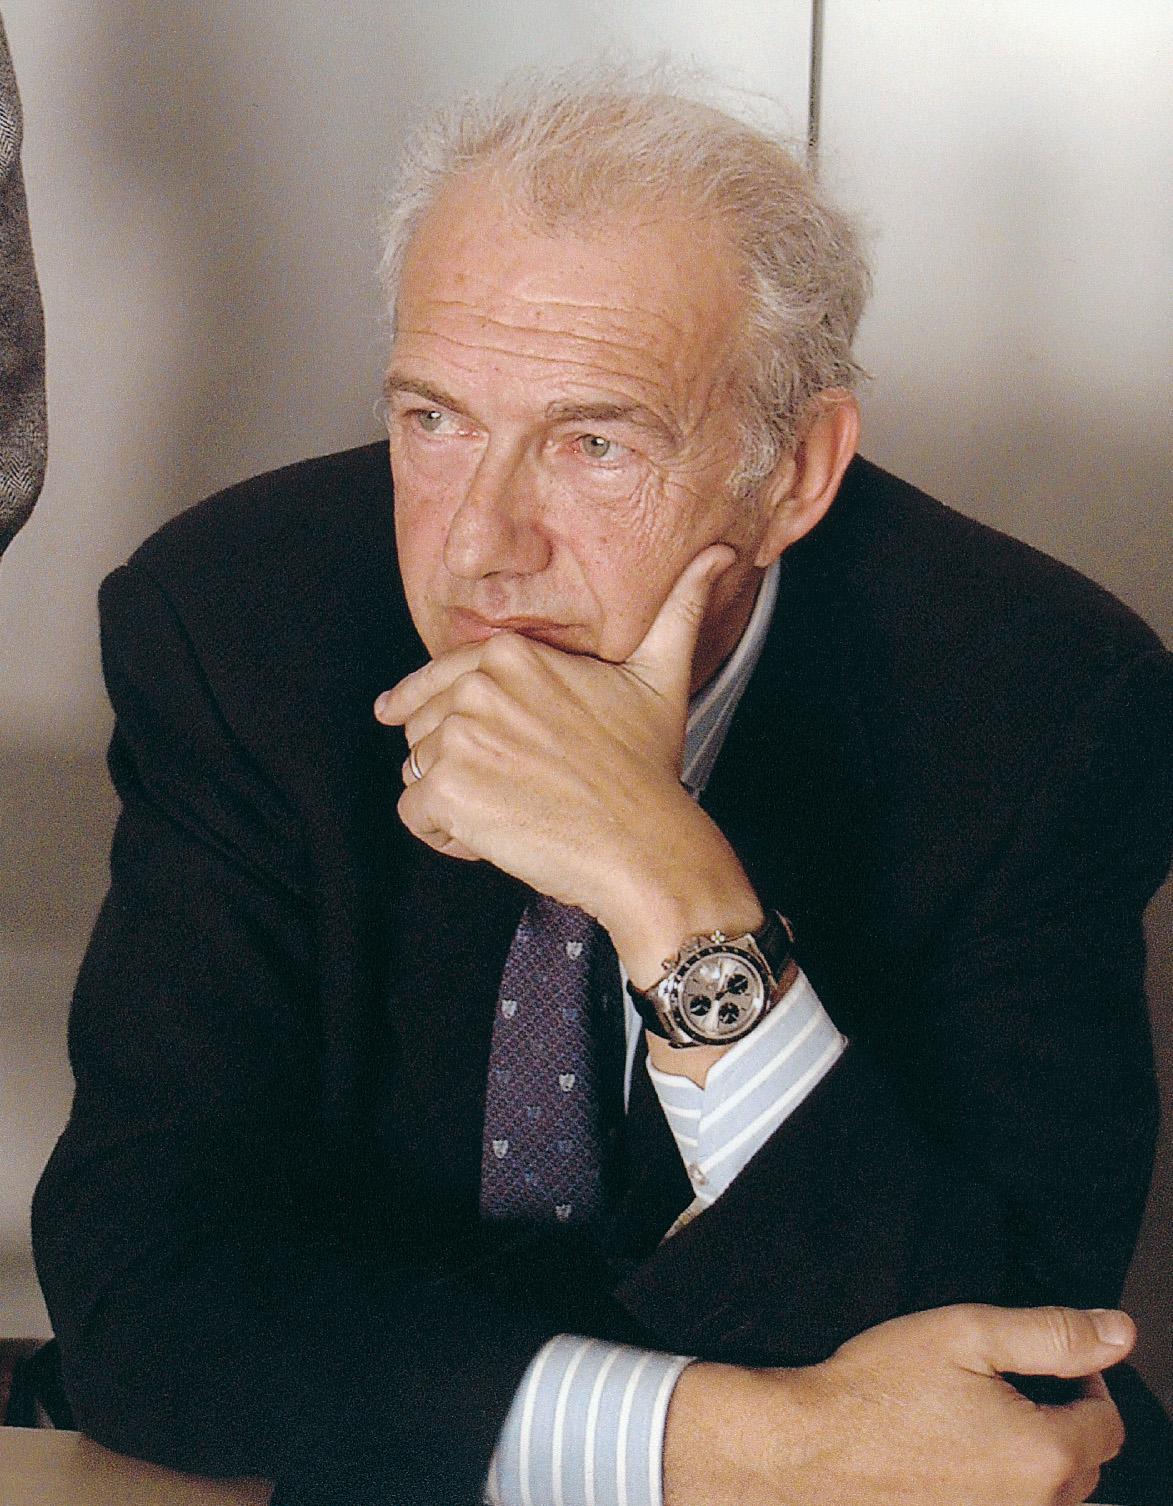 Paolo Corradi